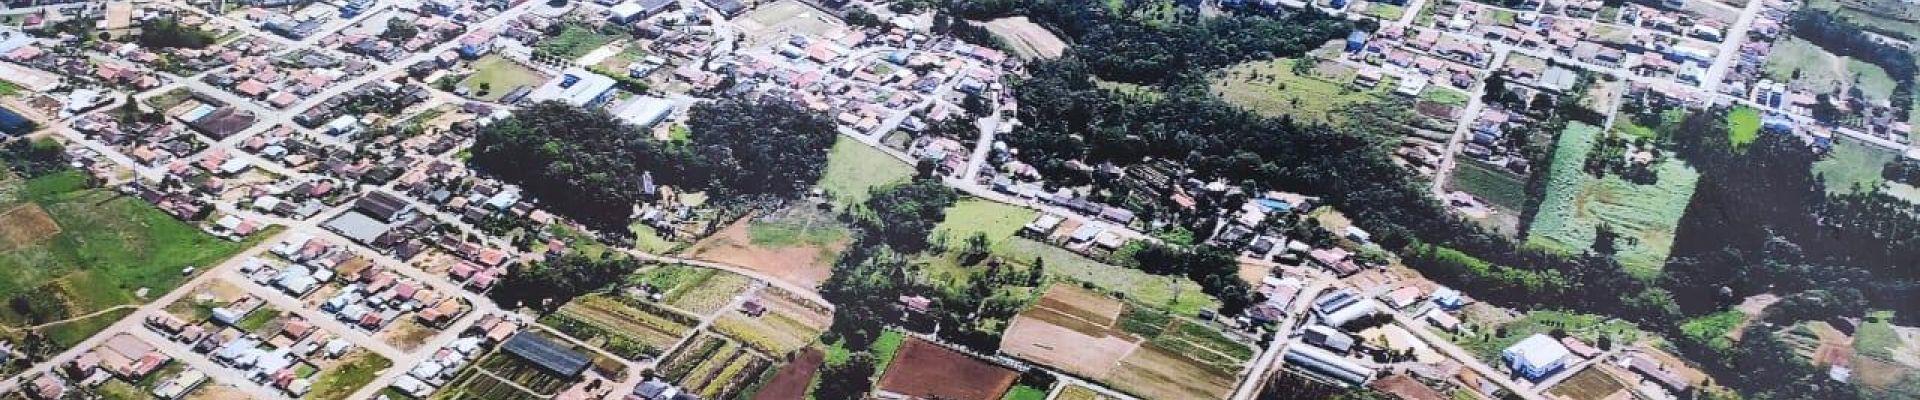 Câmara de Vereadores de Laurentino